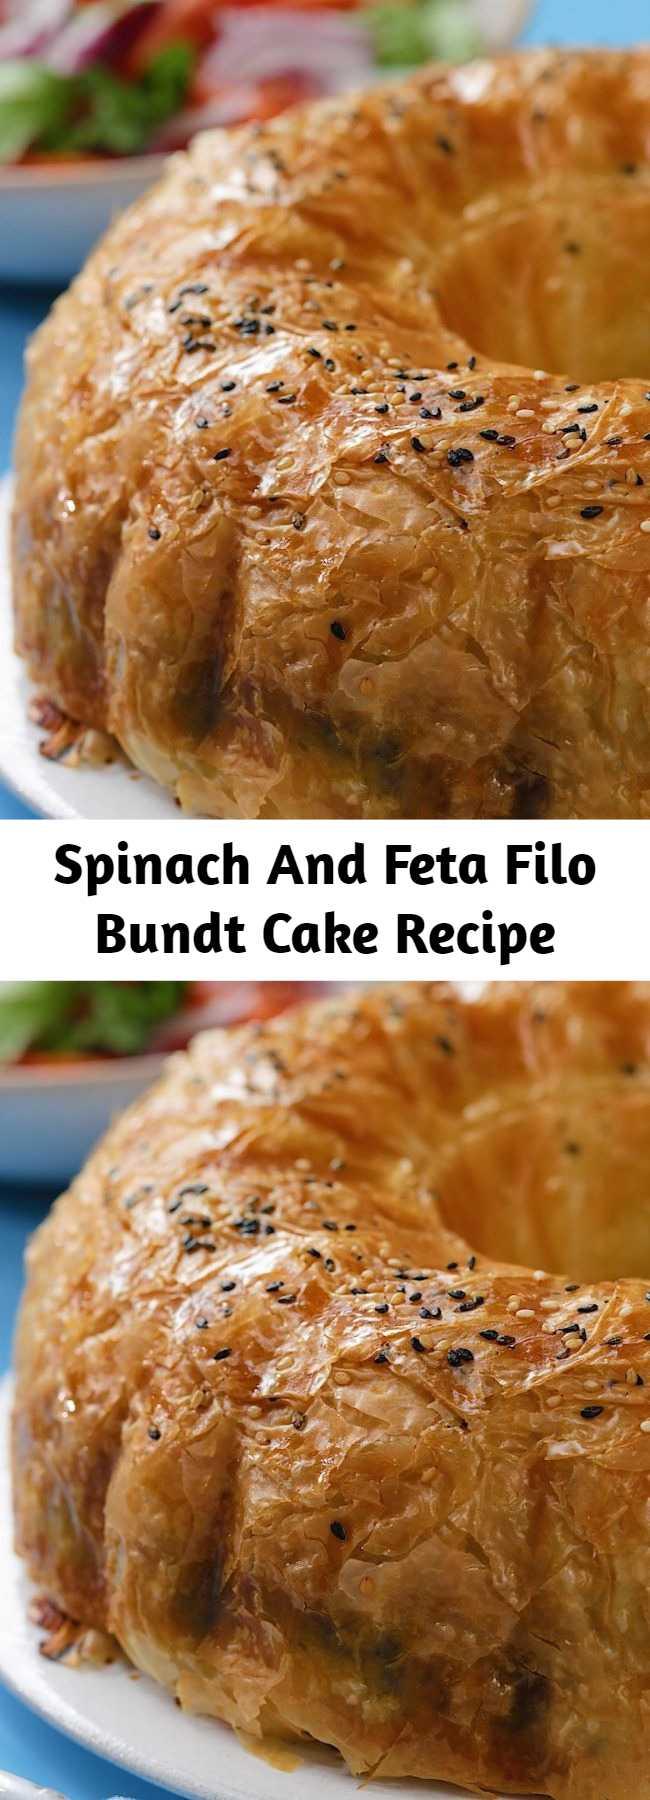 Spinach And Feta Filo Bundt Cake Recipe - This spinach and feta bundt cake is the perfect sharing dish!